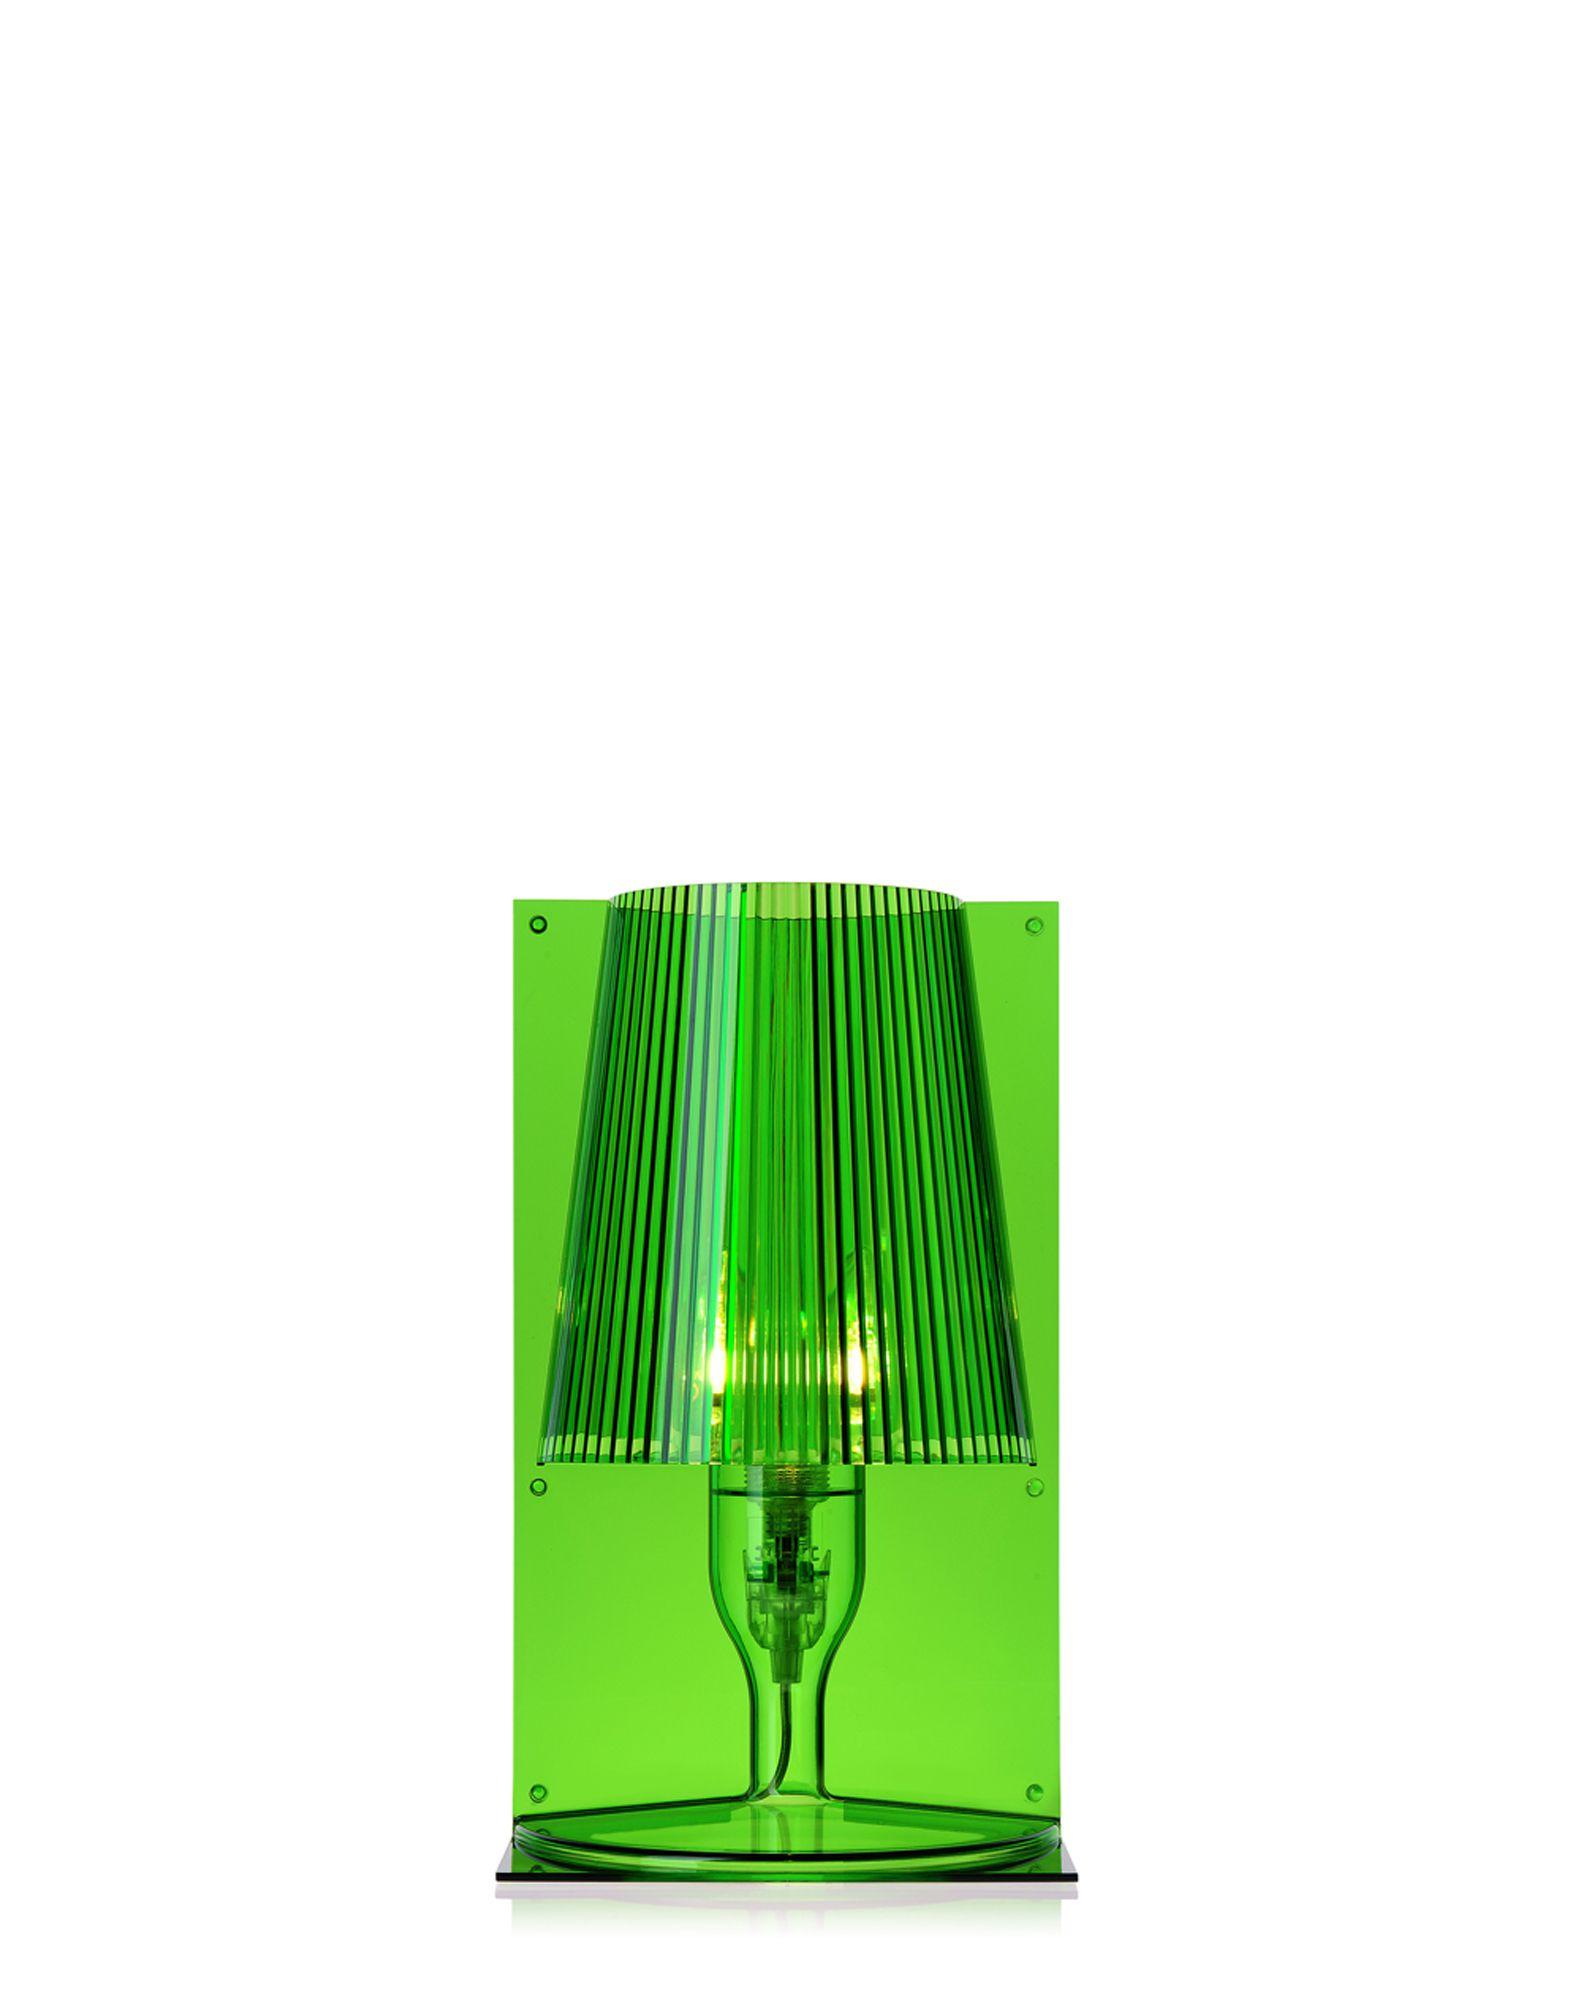 Kartell lampada da tavolo Take verde, Newformsdesign  lampade da tavolo  Ne...